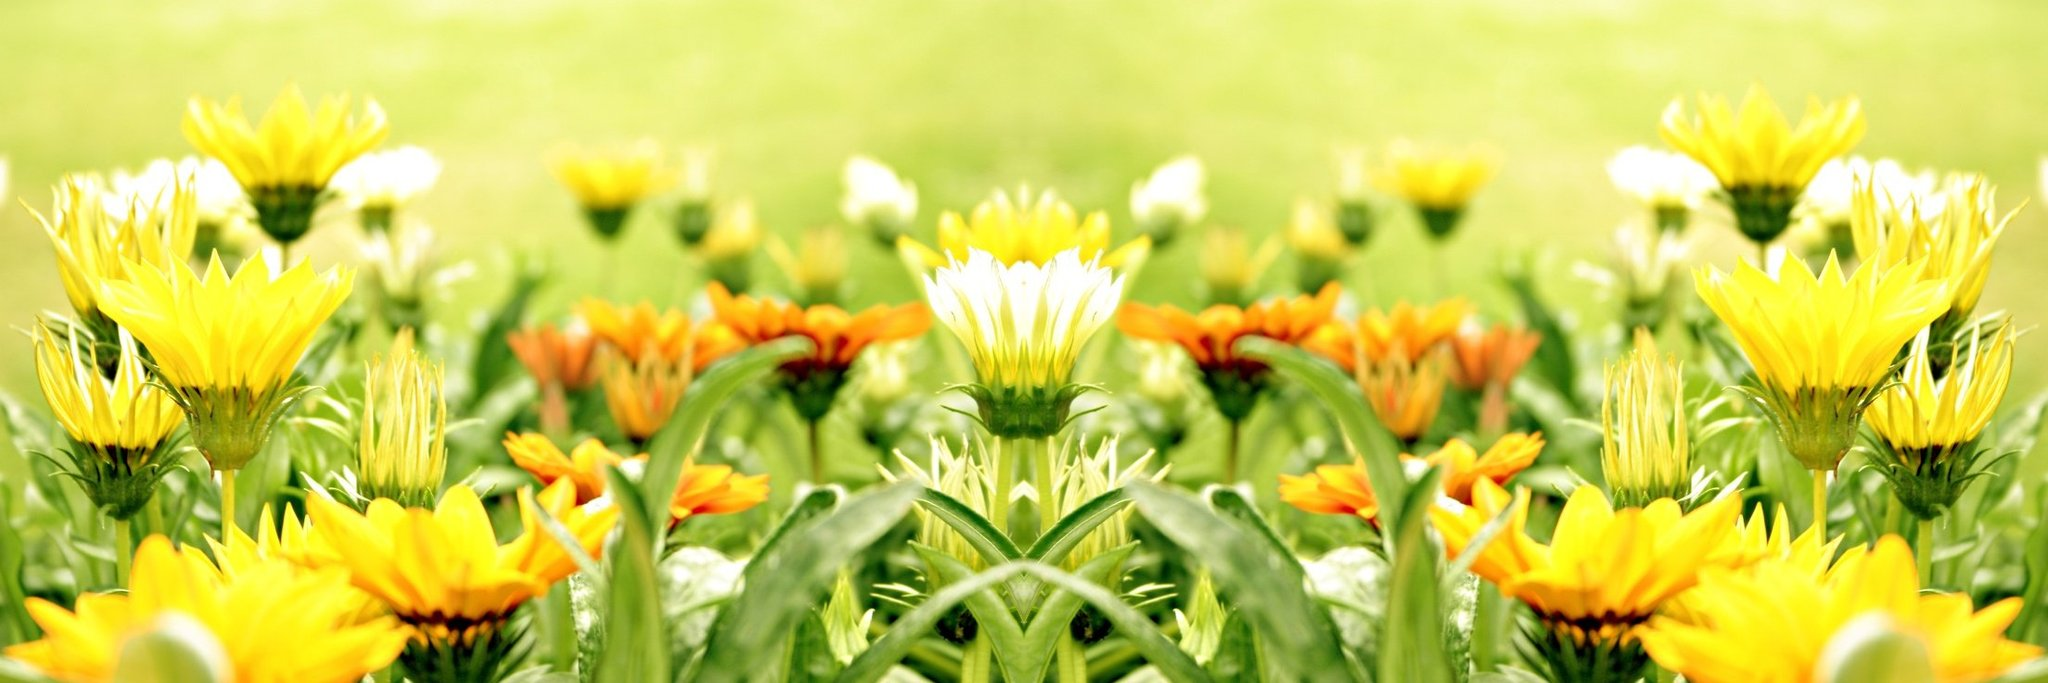 Yellow Flower Background Wallpaper 2048x683